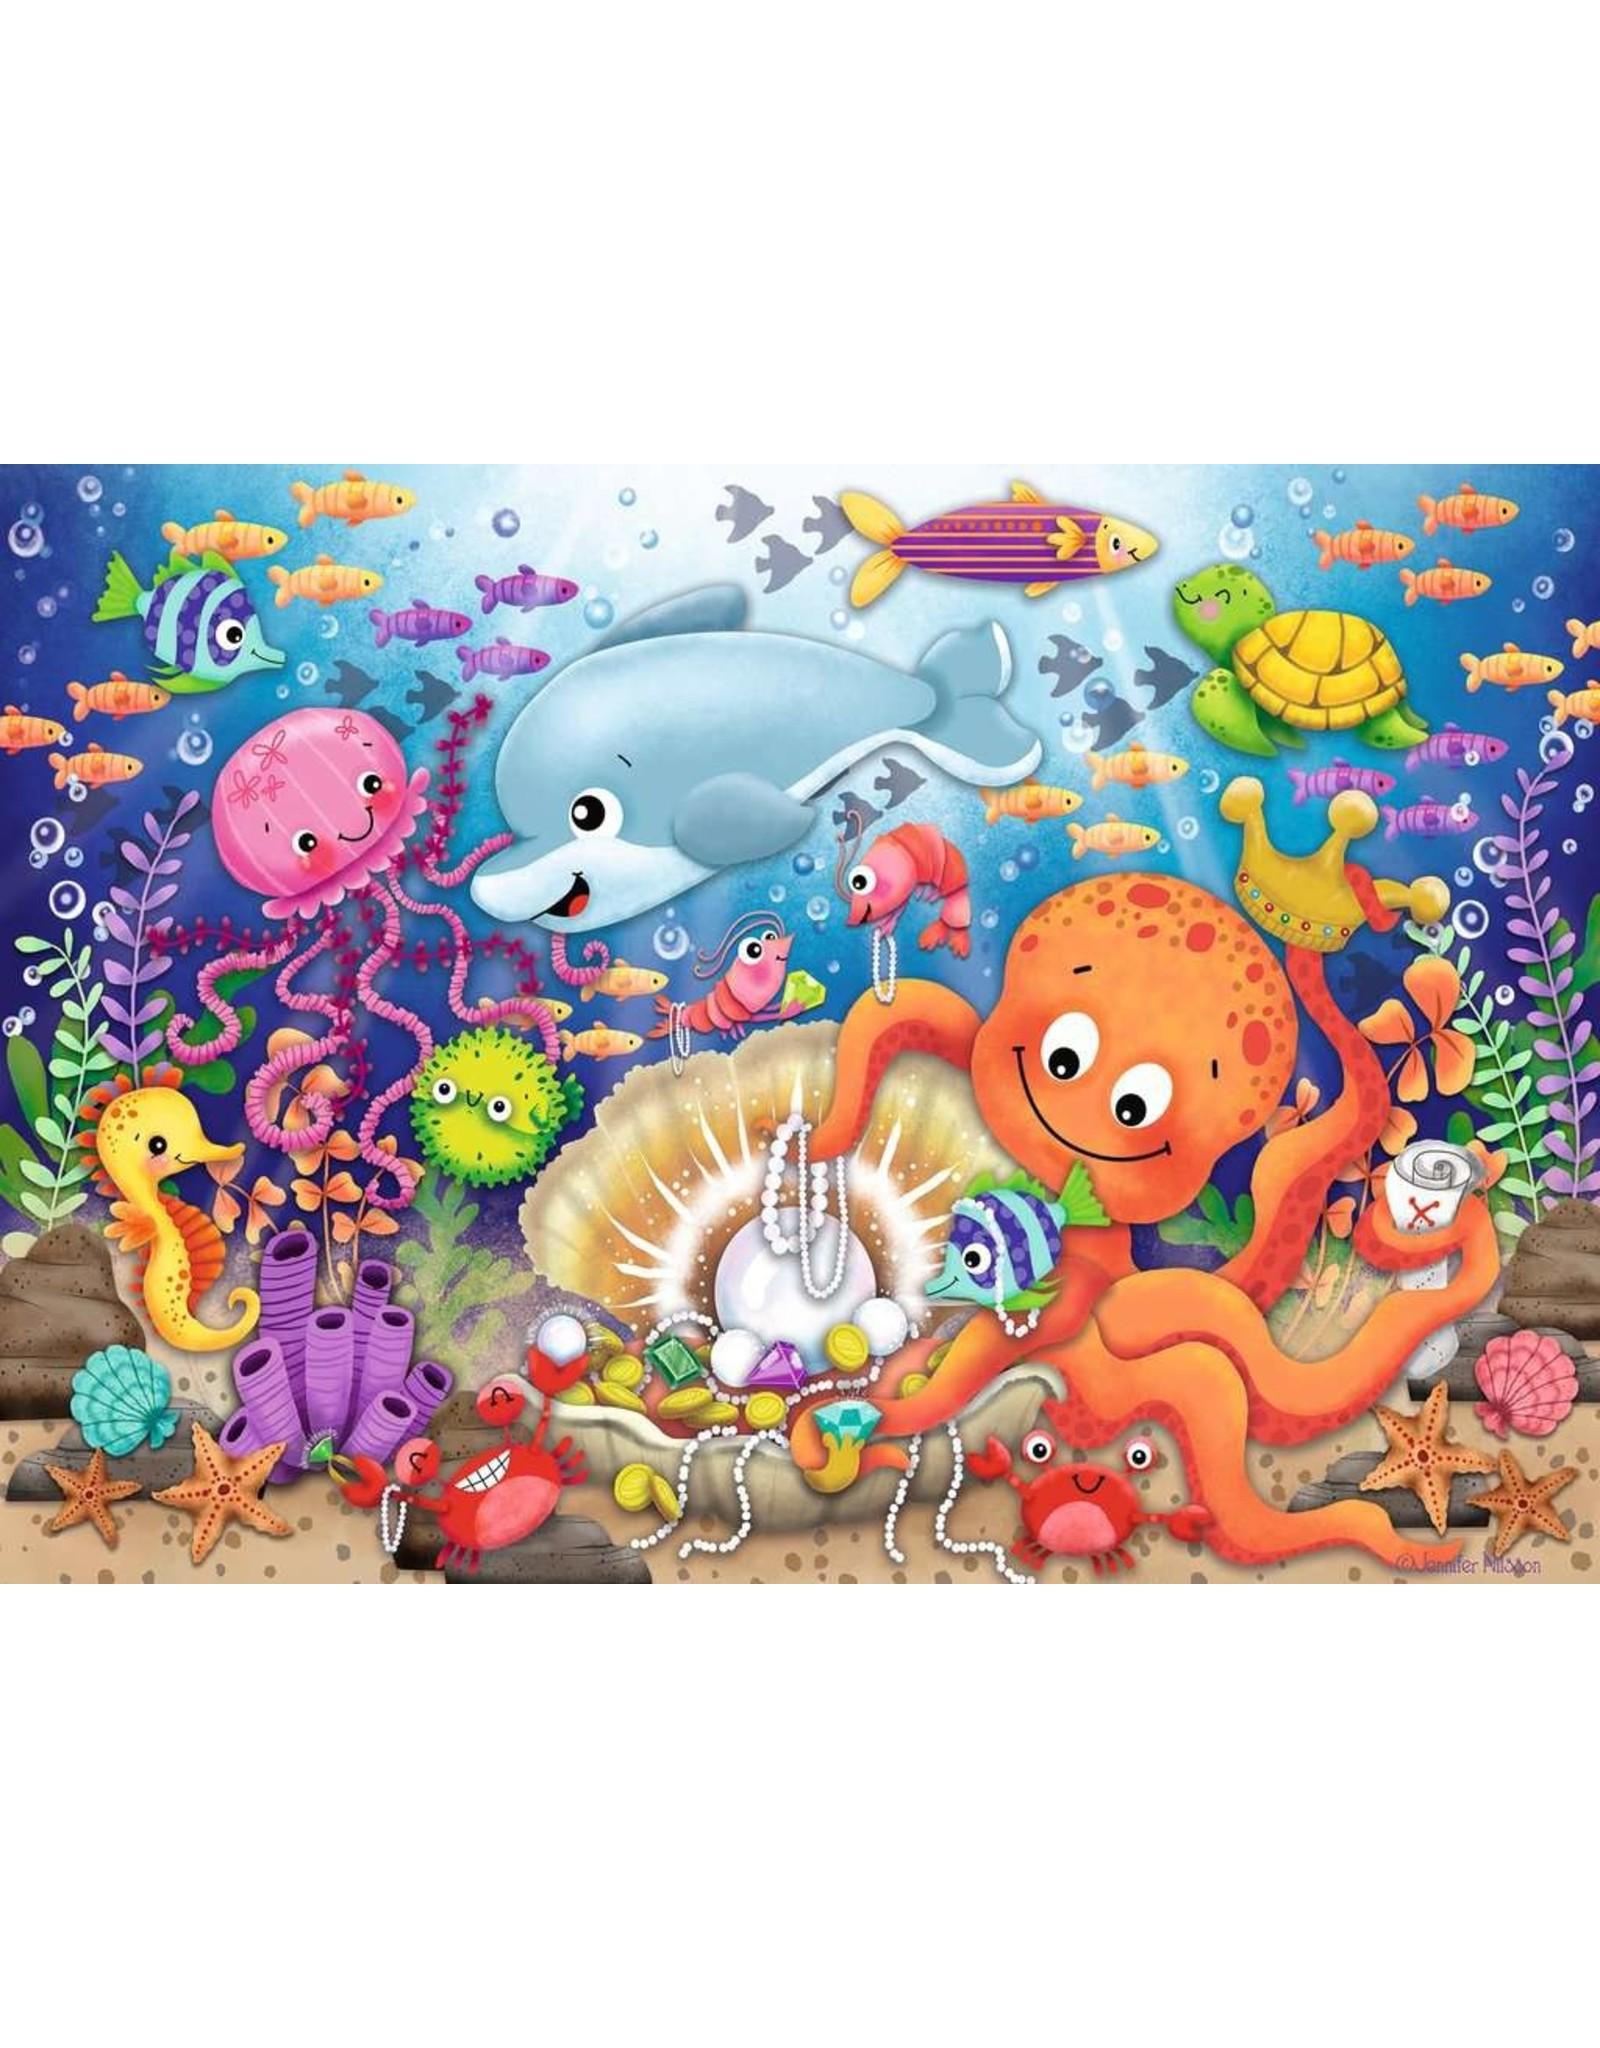 Fishie's Fortune 24 Piece Puzzle